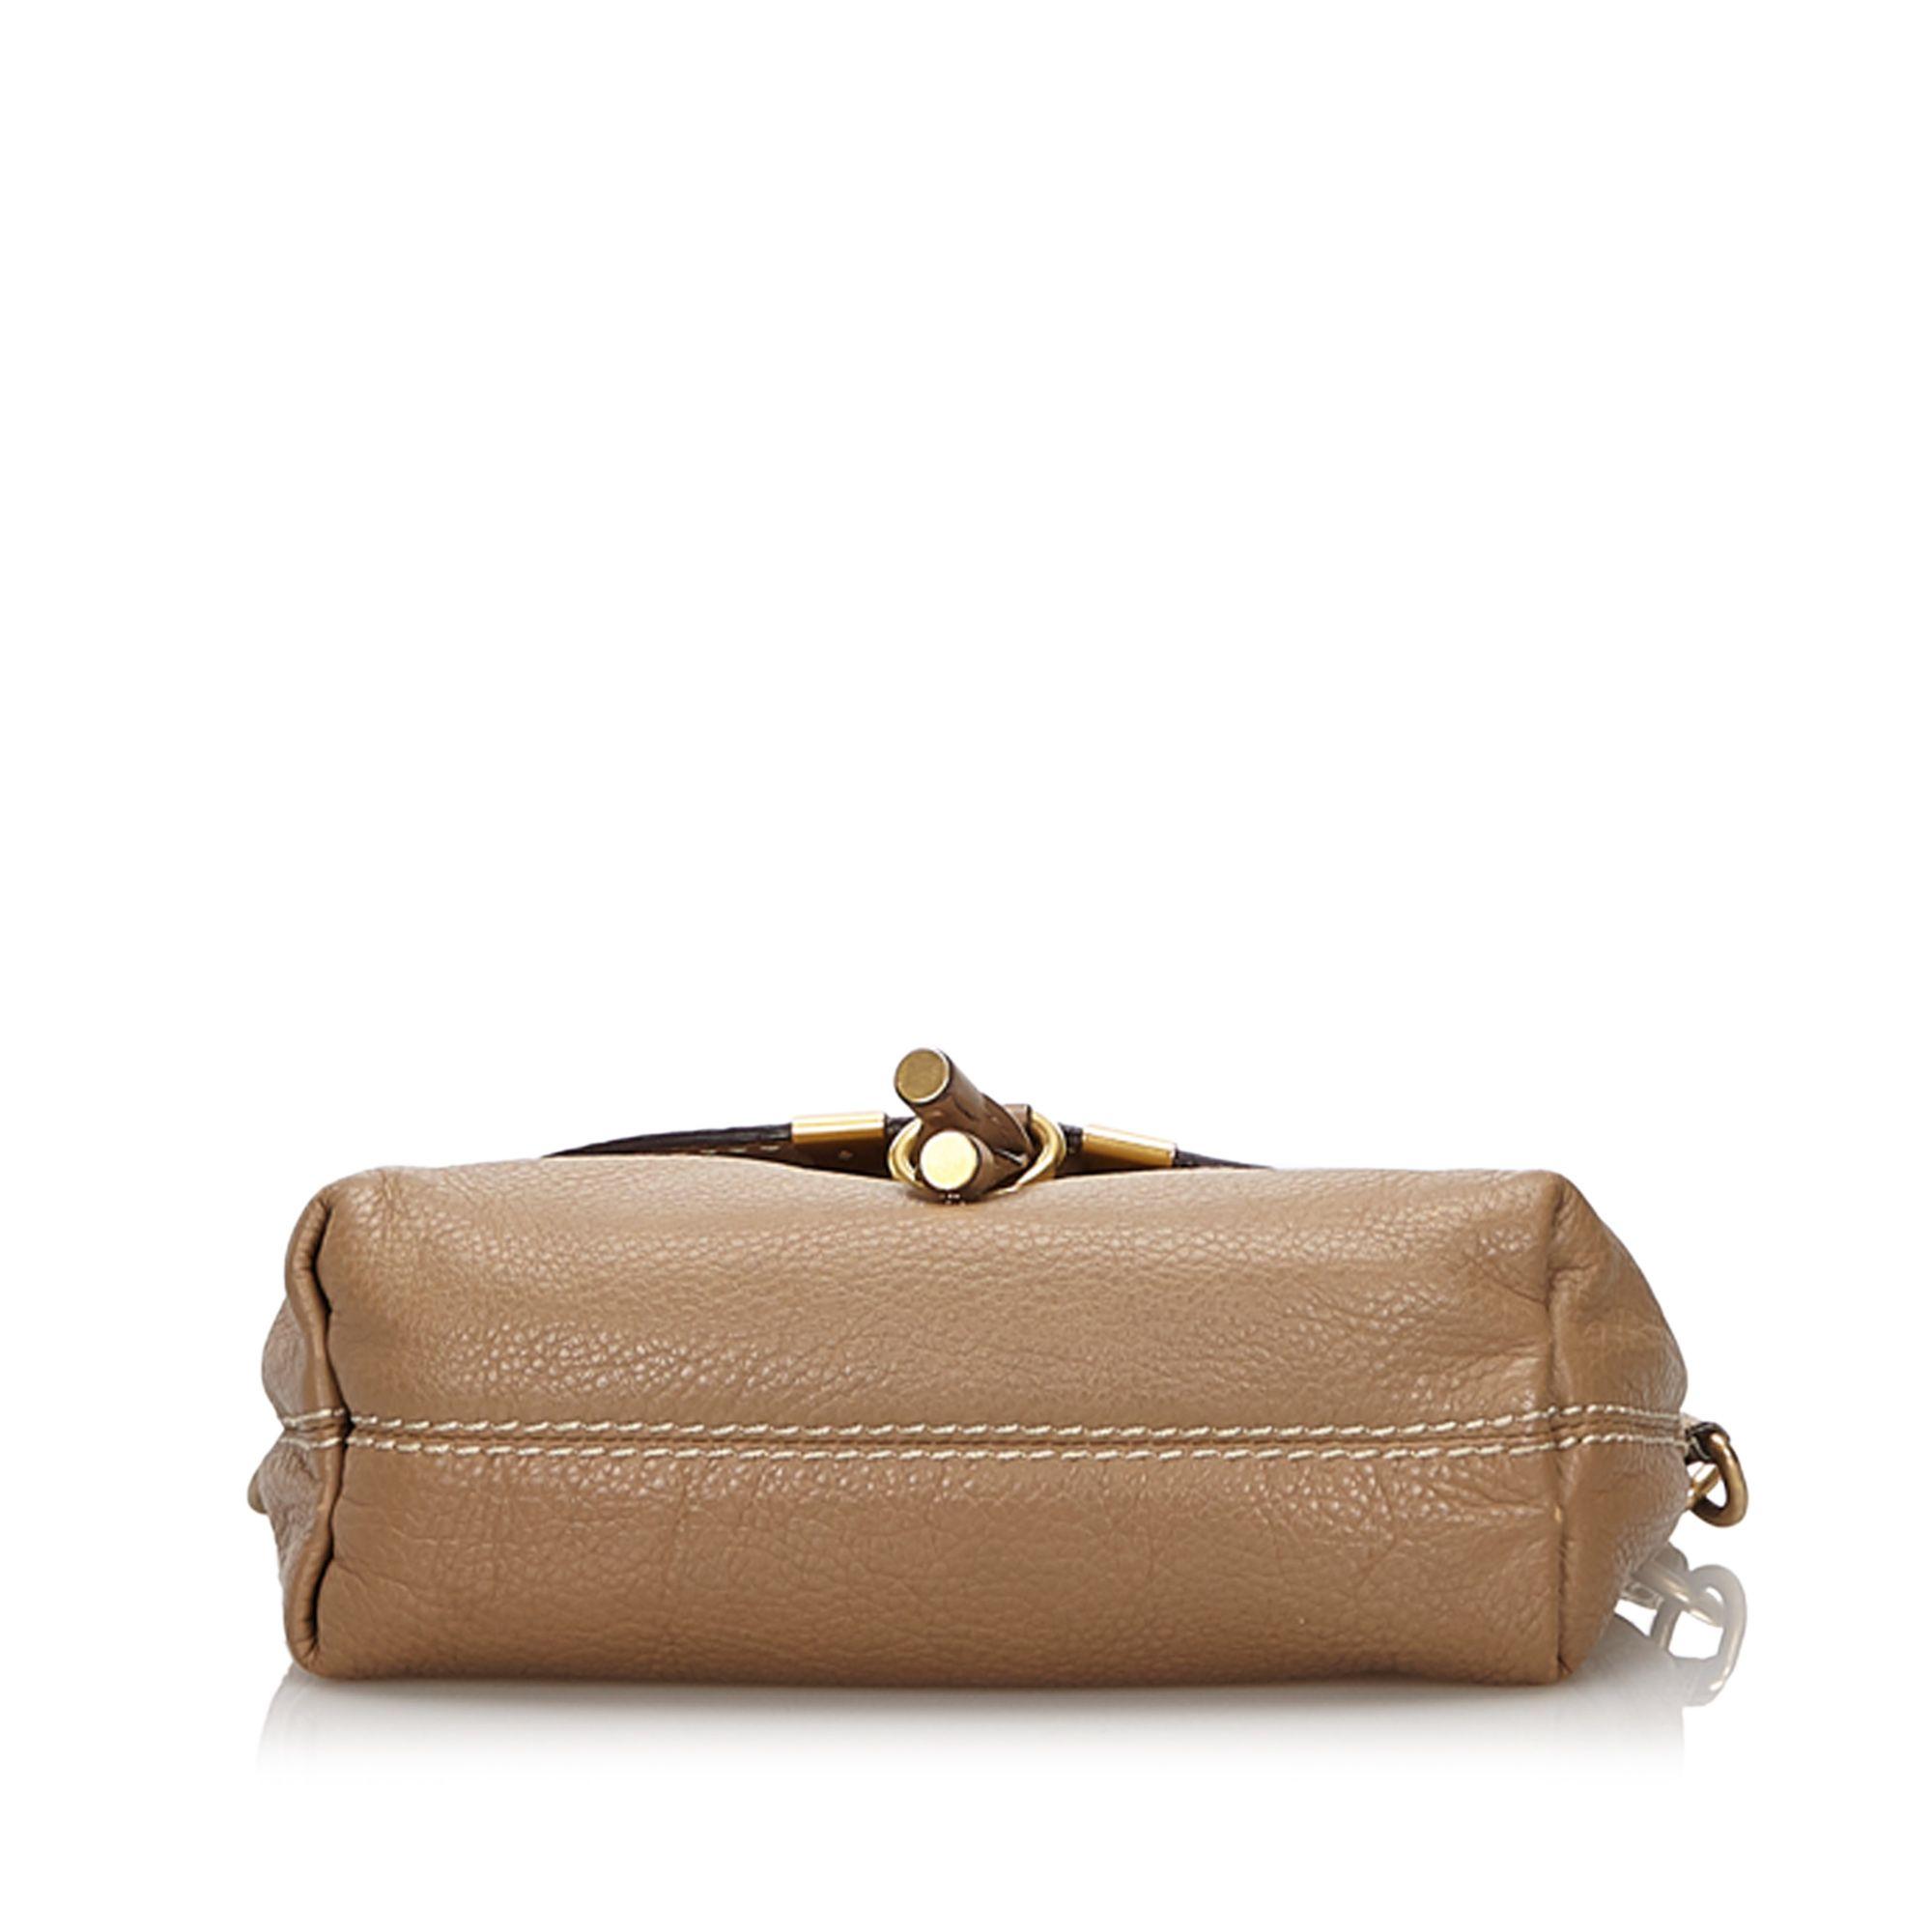 Vintage Chloe Small Leather Marcie Crossbody Bag Brown